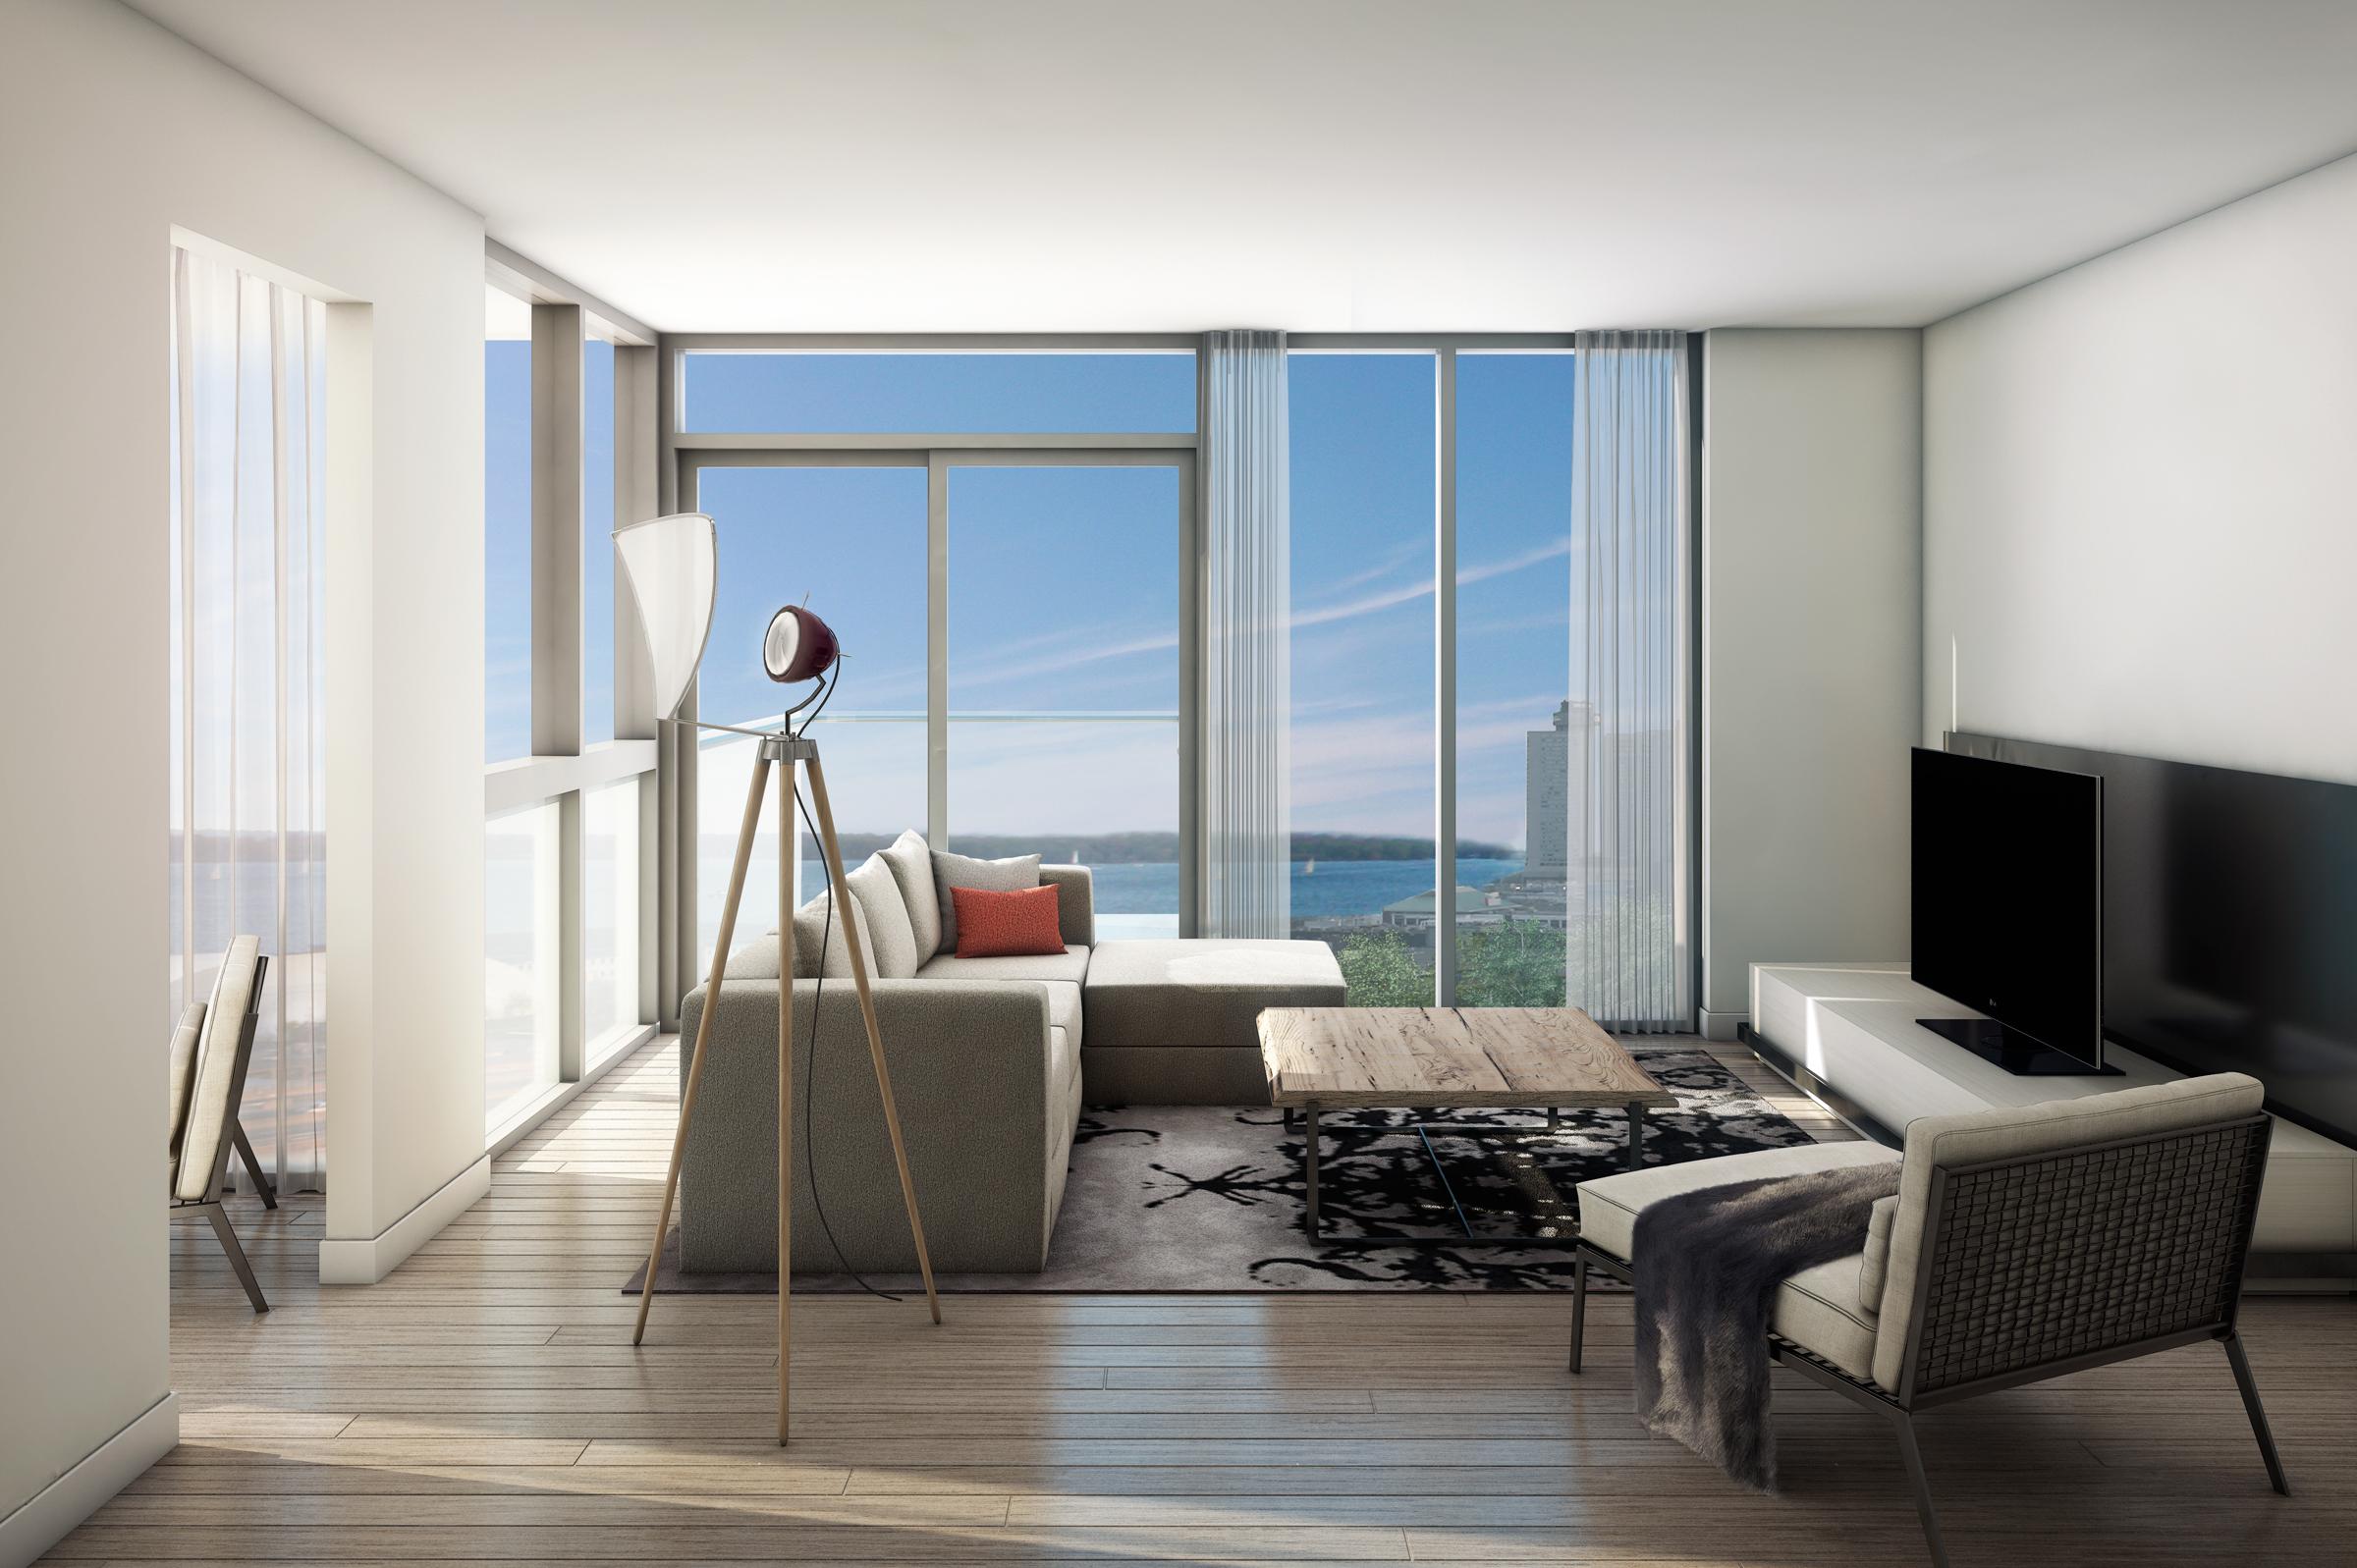 Monde_LivingRoom_East Bayfront Condo